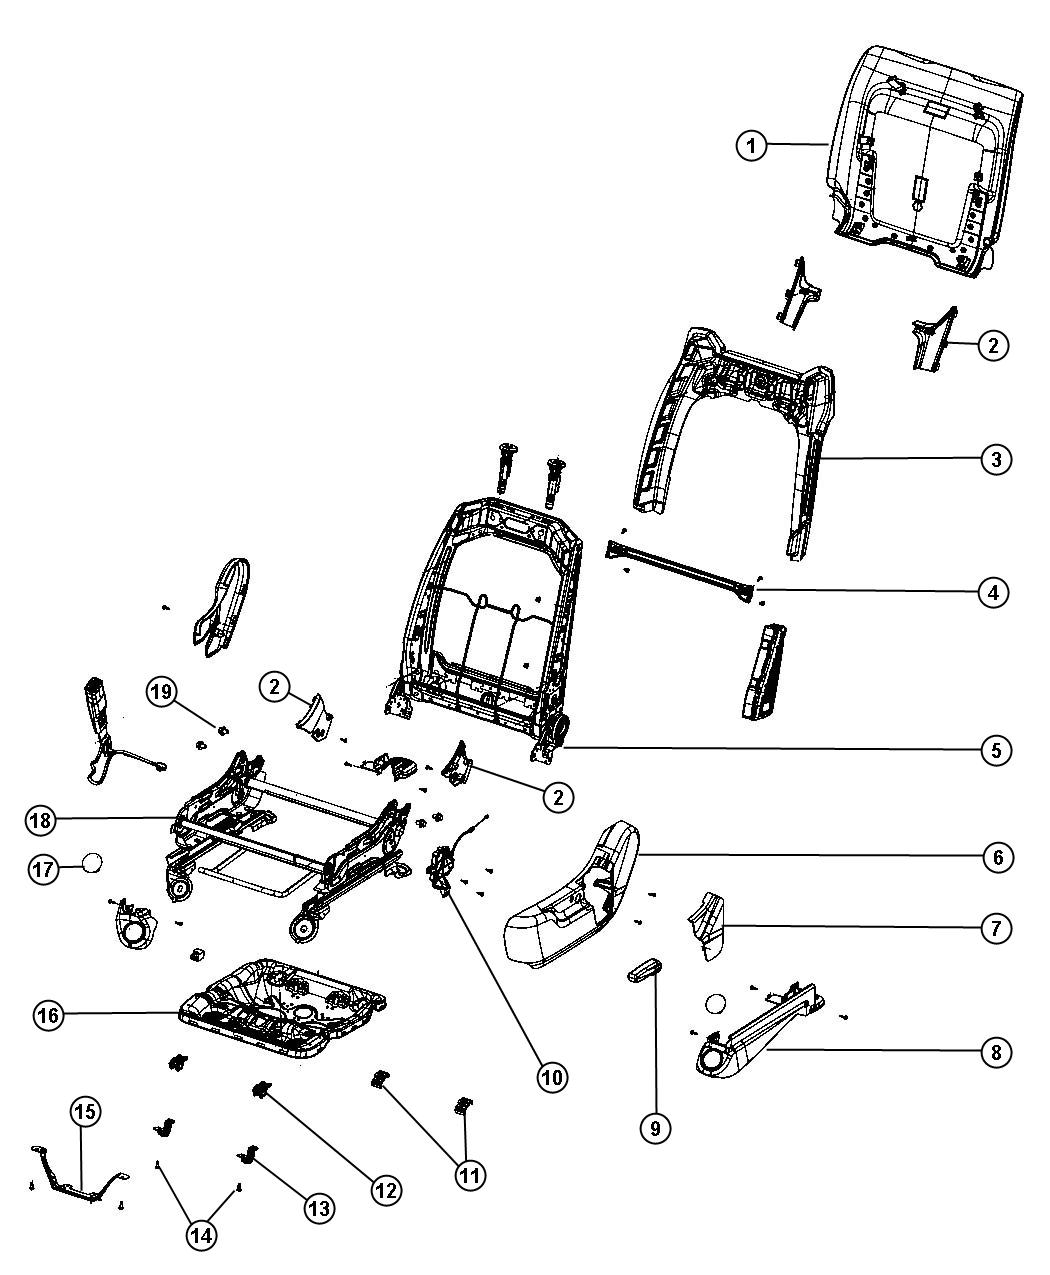 Dodge Durango Cover, shield. Seat recliner, seat riser